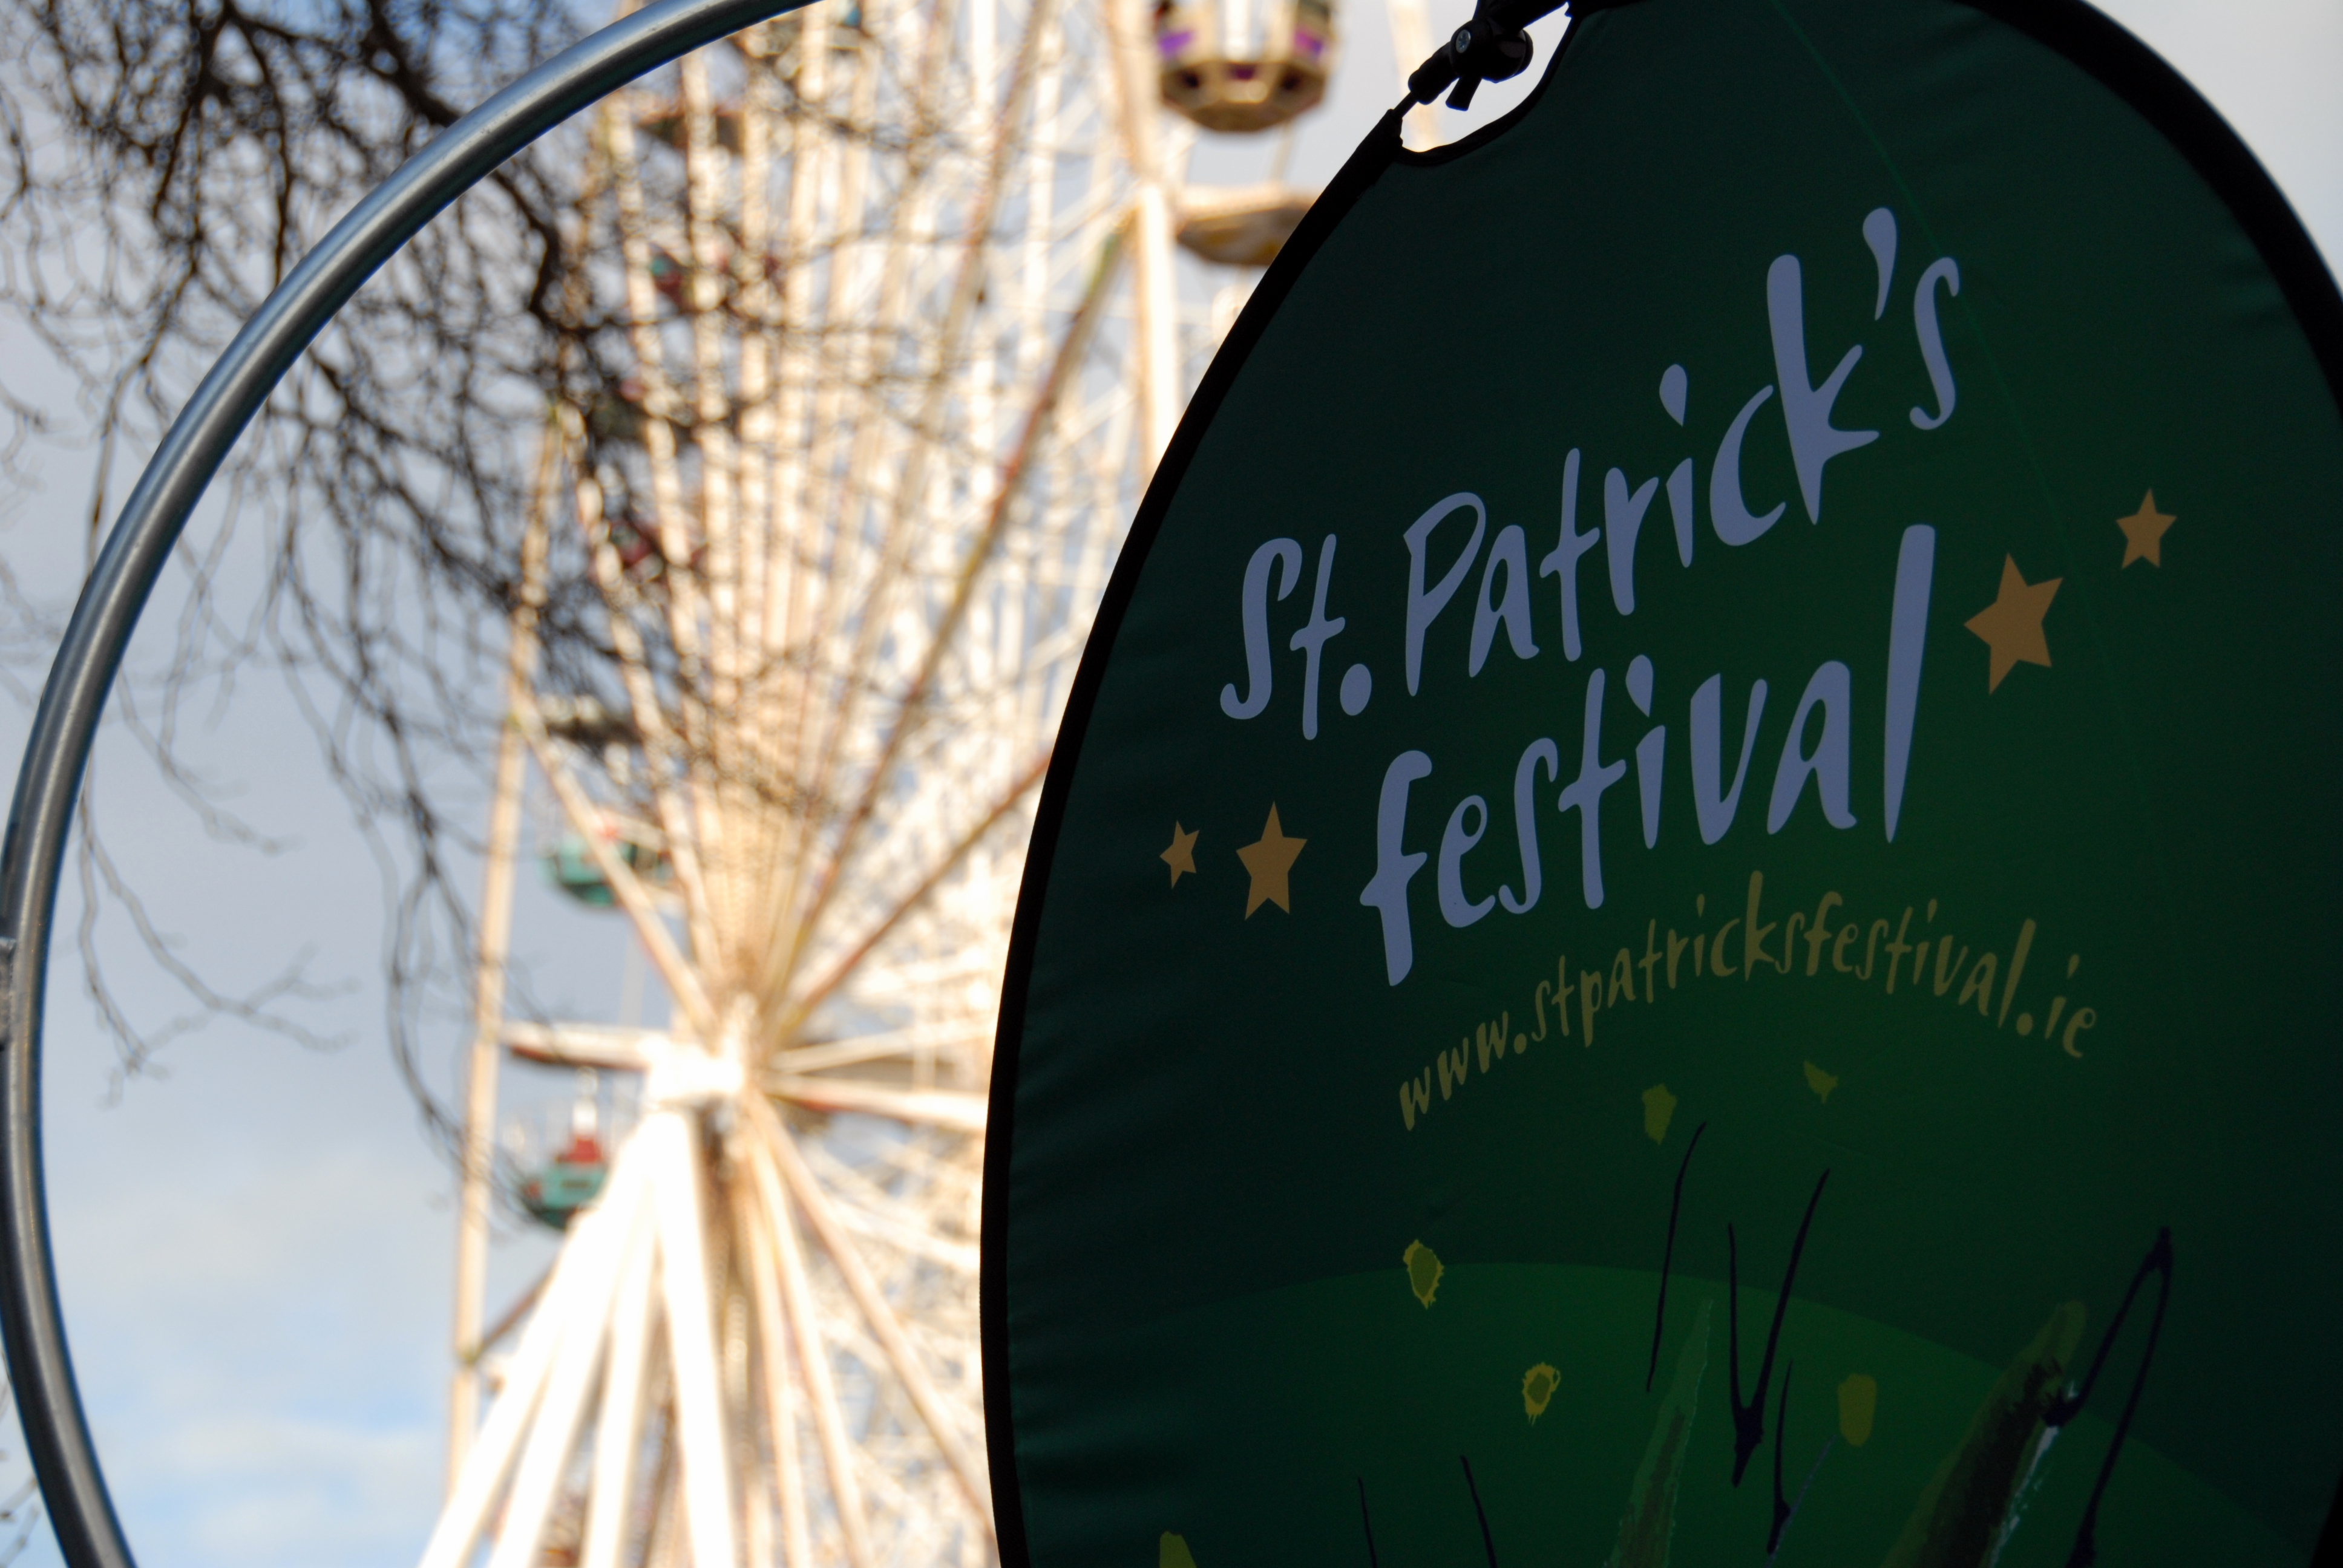 Saint Patrick's Festival em Dublin